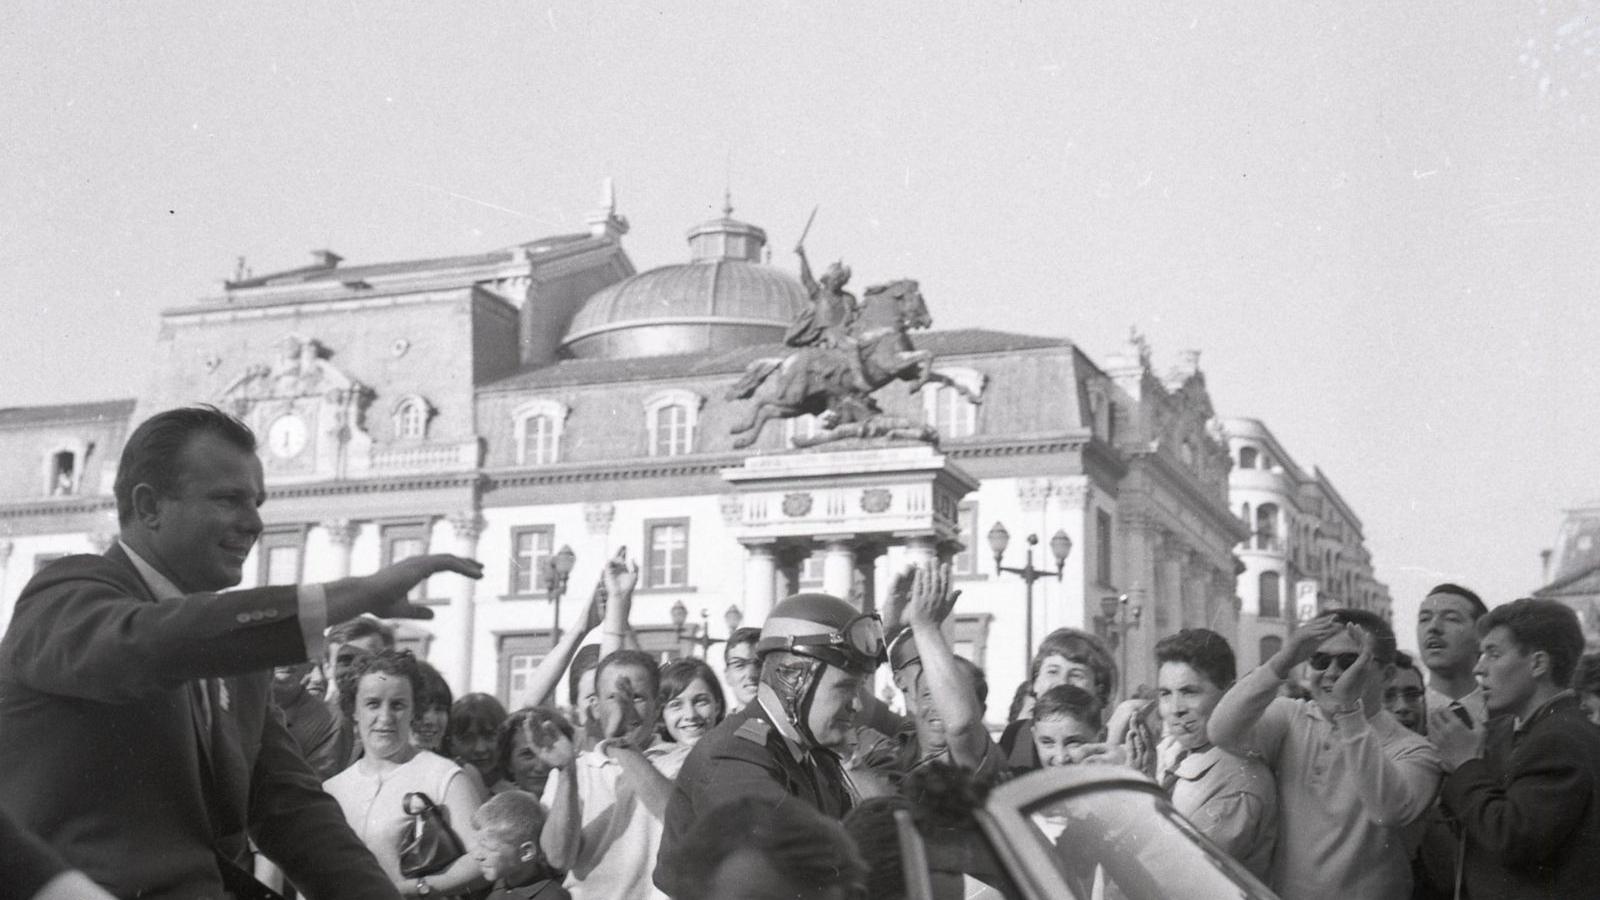 © Youri Gagarine, place de Jaude